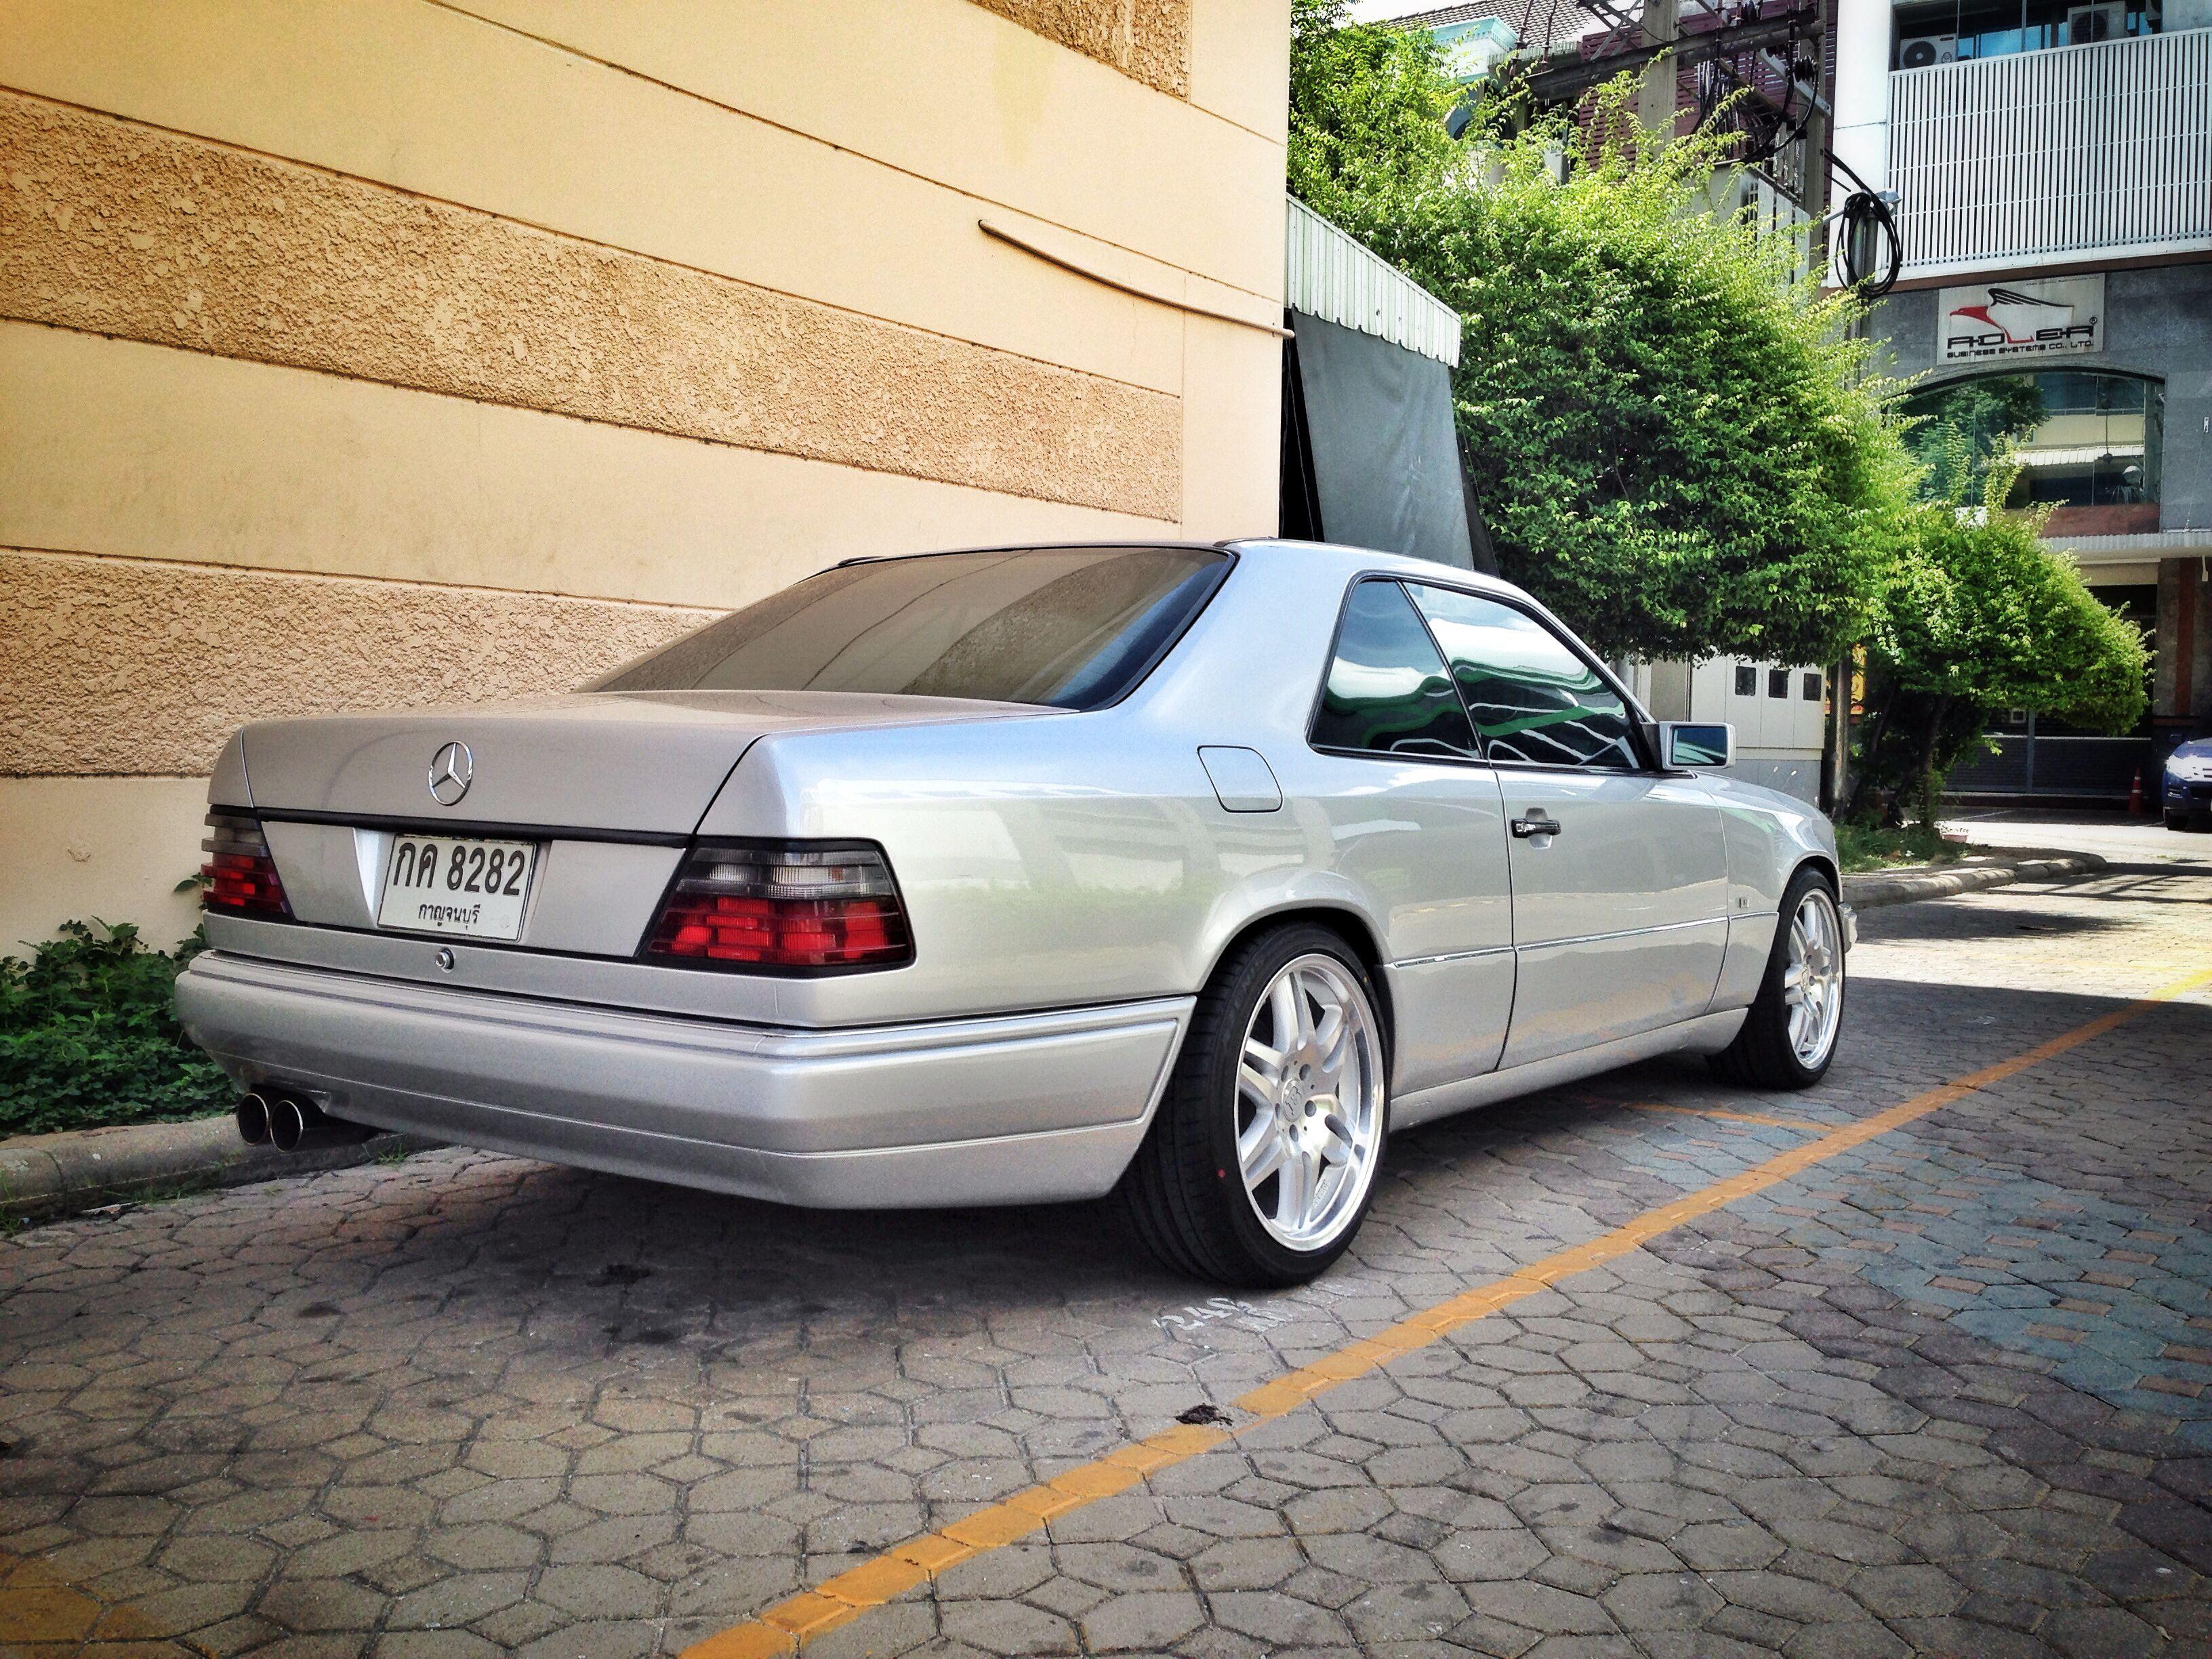 W124 brabus 300ce mercedes benz w124 pinterest for Mercedes benz 300ce